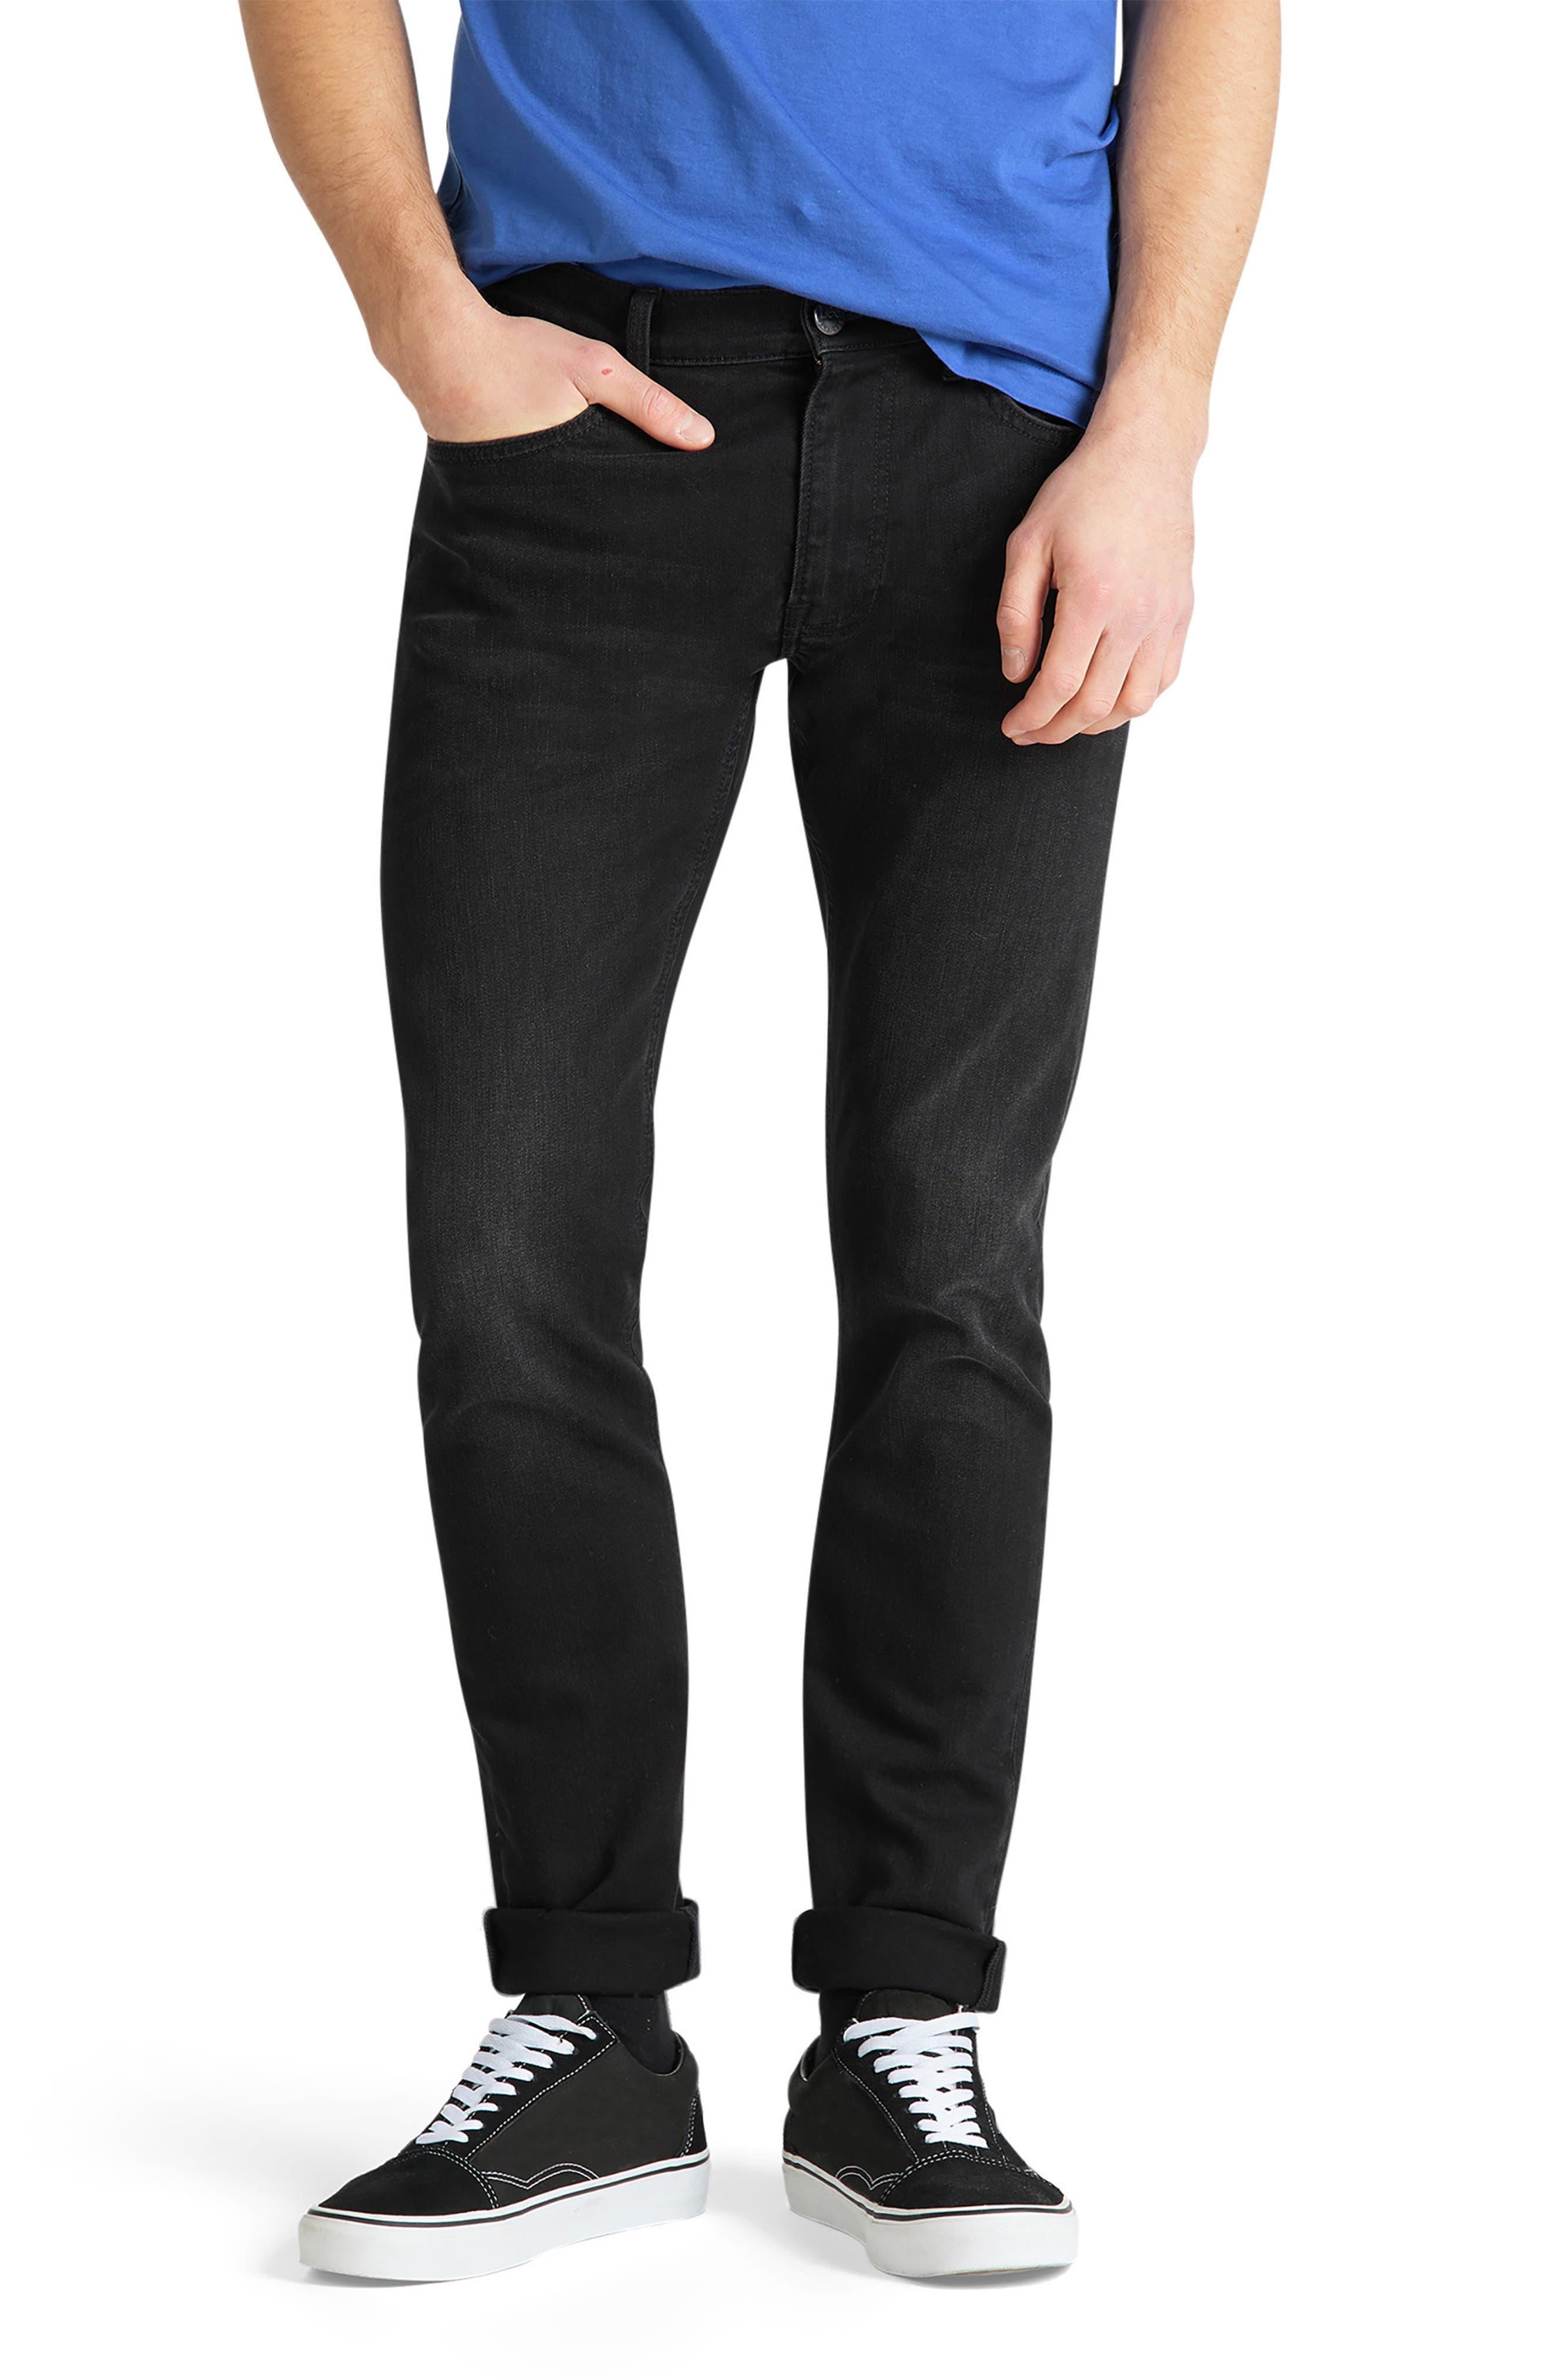 Men's Lee Modern Luke Tapered Slim Fit Jeans